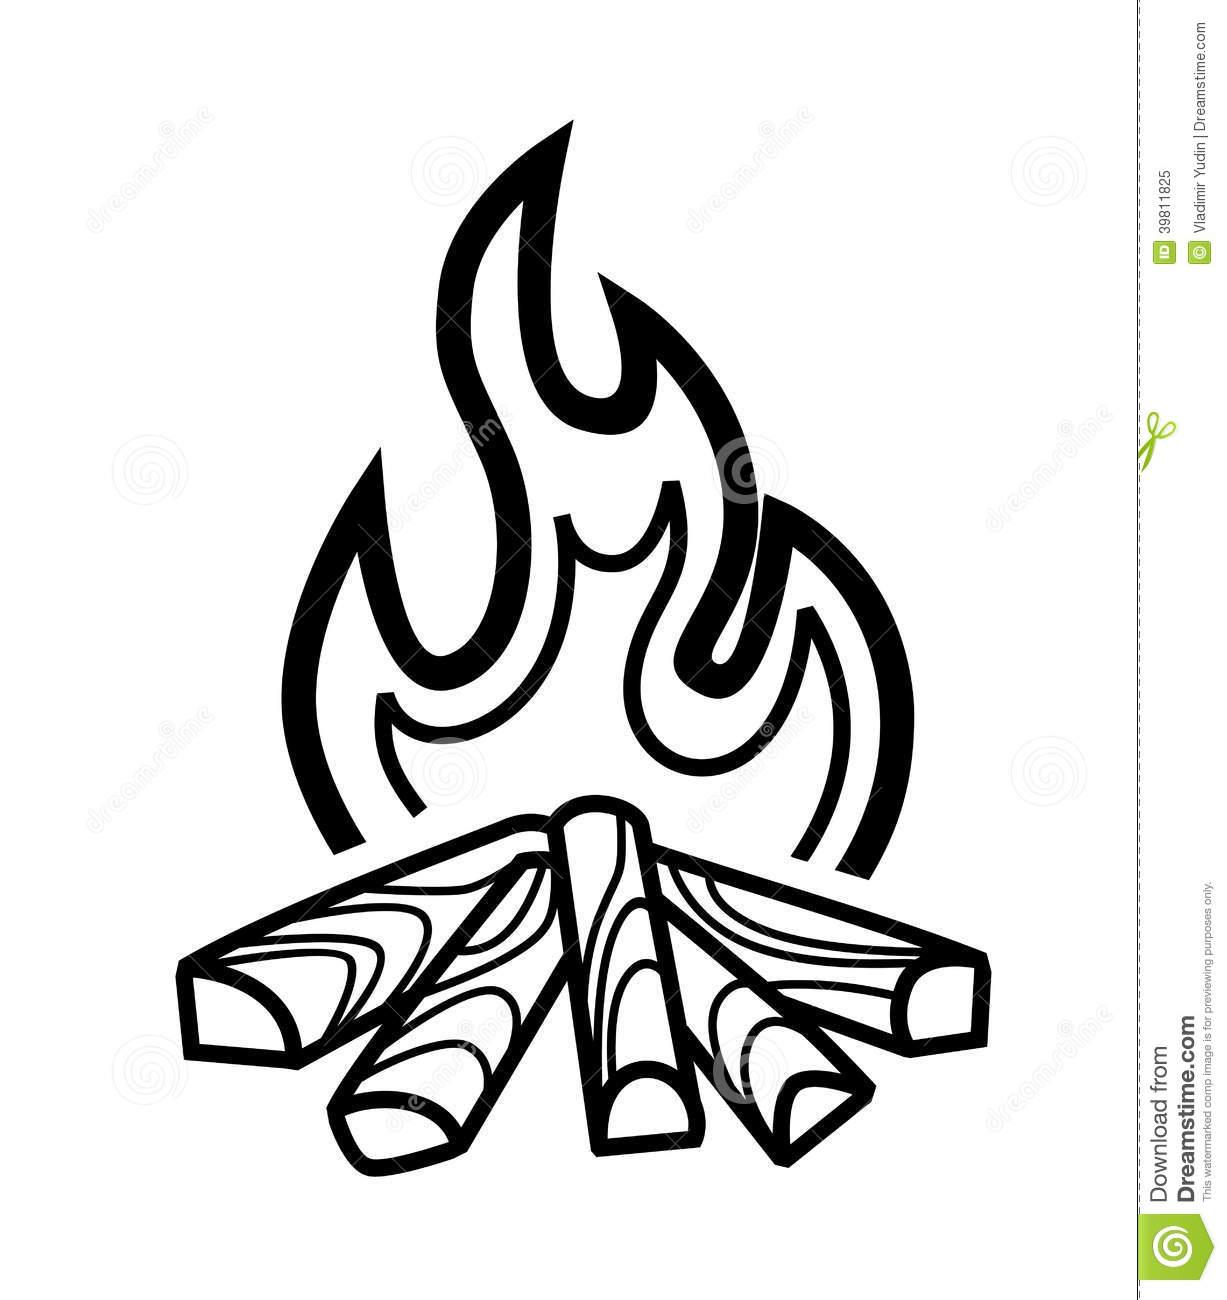 1227x1300 Bonfire Clipart Black And White